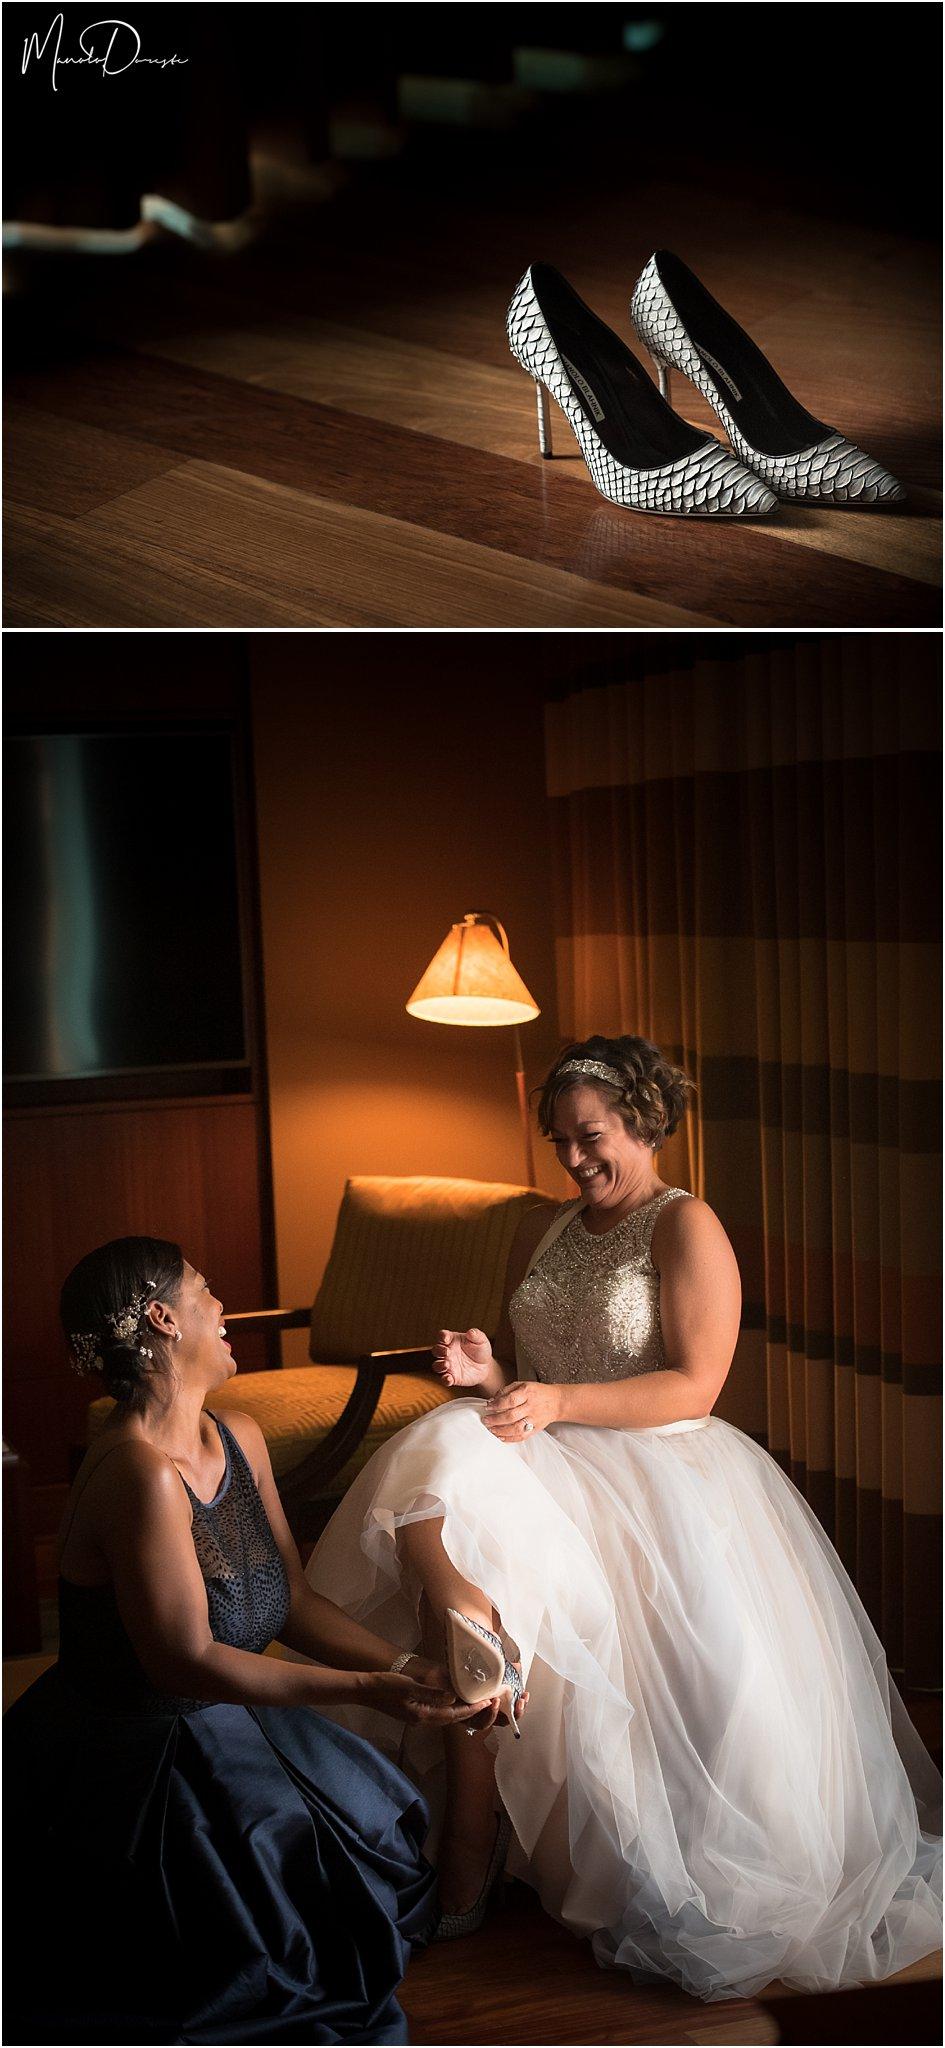 0439_ManoloDoreste_InFocusStudios_Wedding_Family_Photography_Miami_MiamiPhotographer.jpg